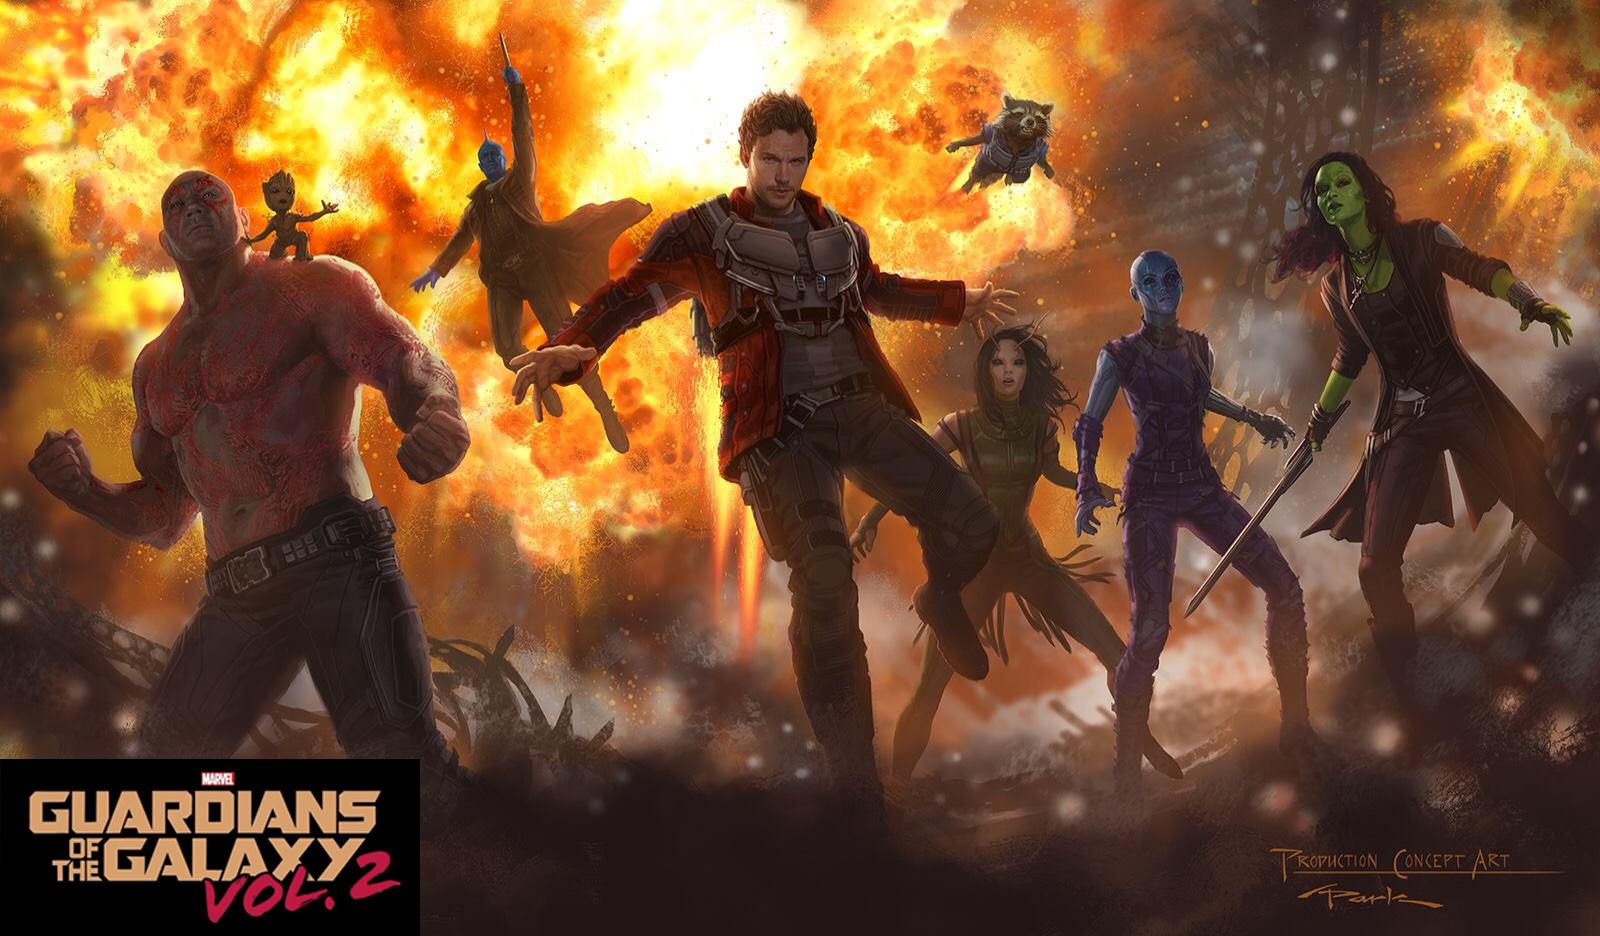 Guardians-of-the-Galaxy-Vol-2-3D-mantis-babygroot-conecpt-art